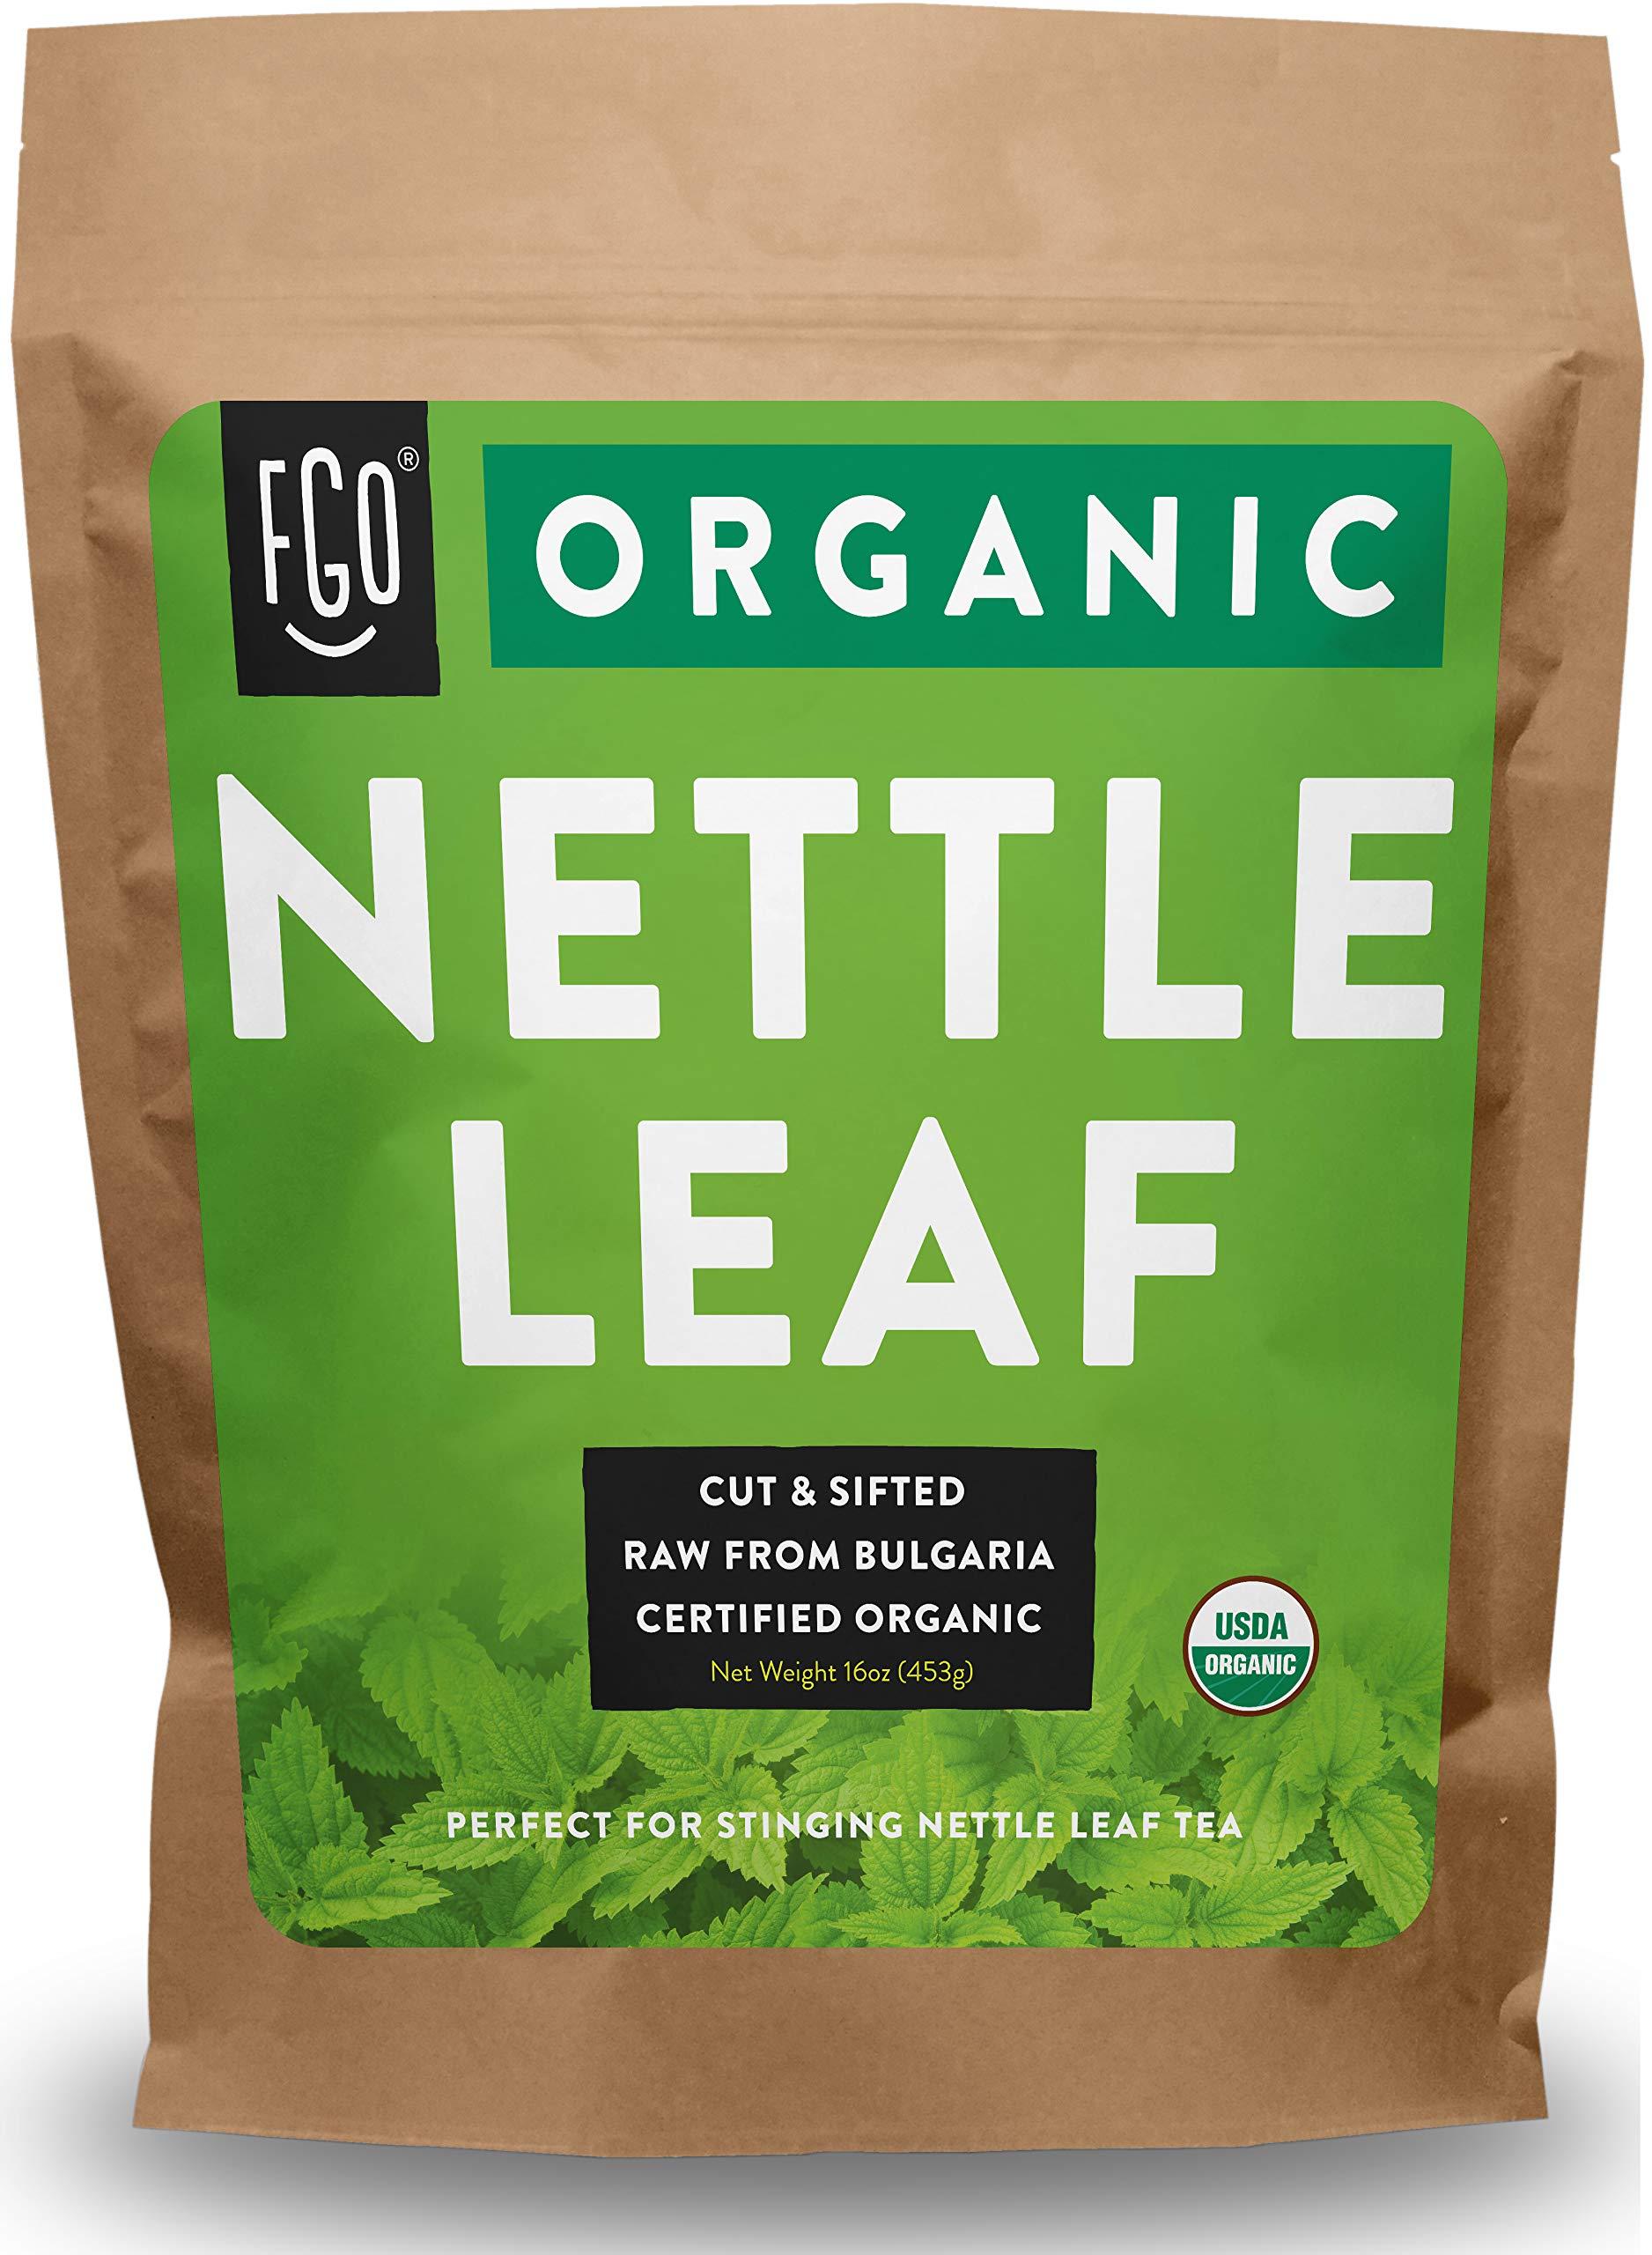 Organic Nettle Leaf | Herbal Tea (200+ Cups) | Cut & Sifted | 16oz Resealable Kraft Bag | 100% Raw From Bulgaria | by Feel Good Organics by FGO